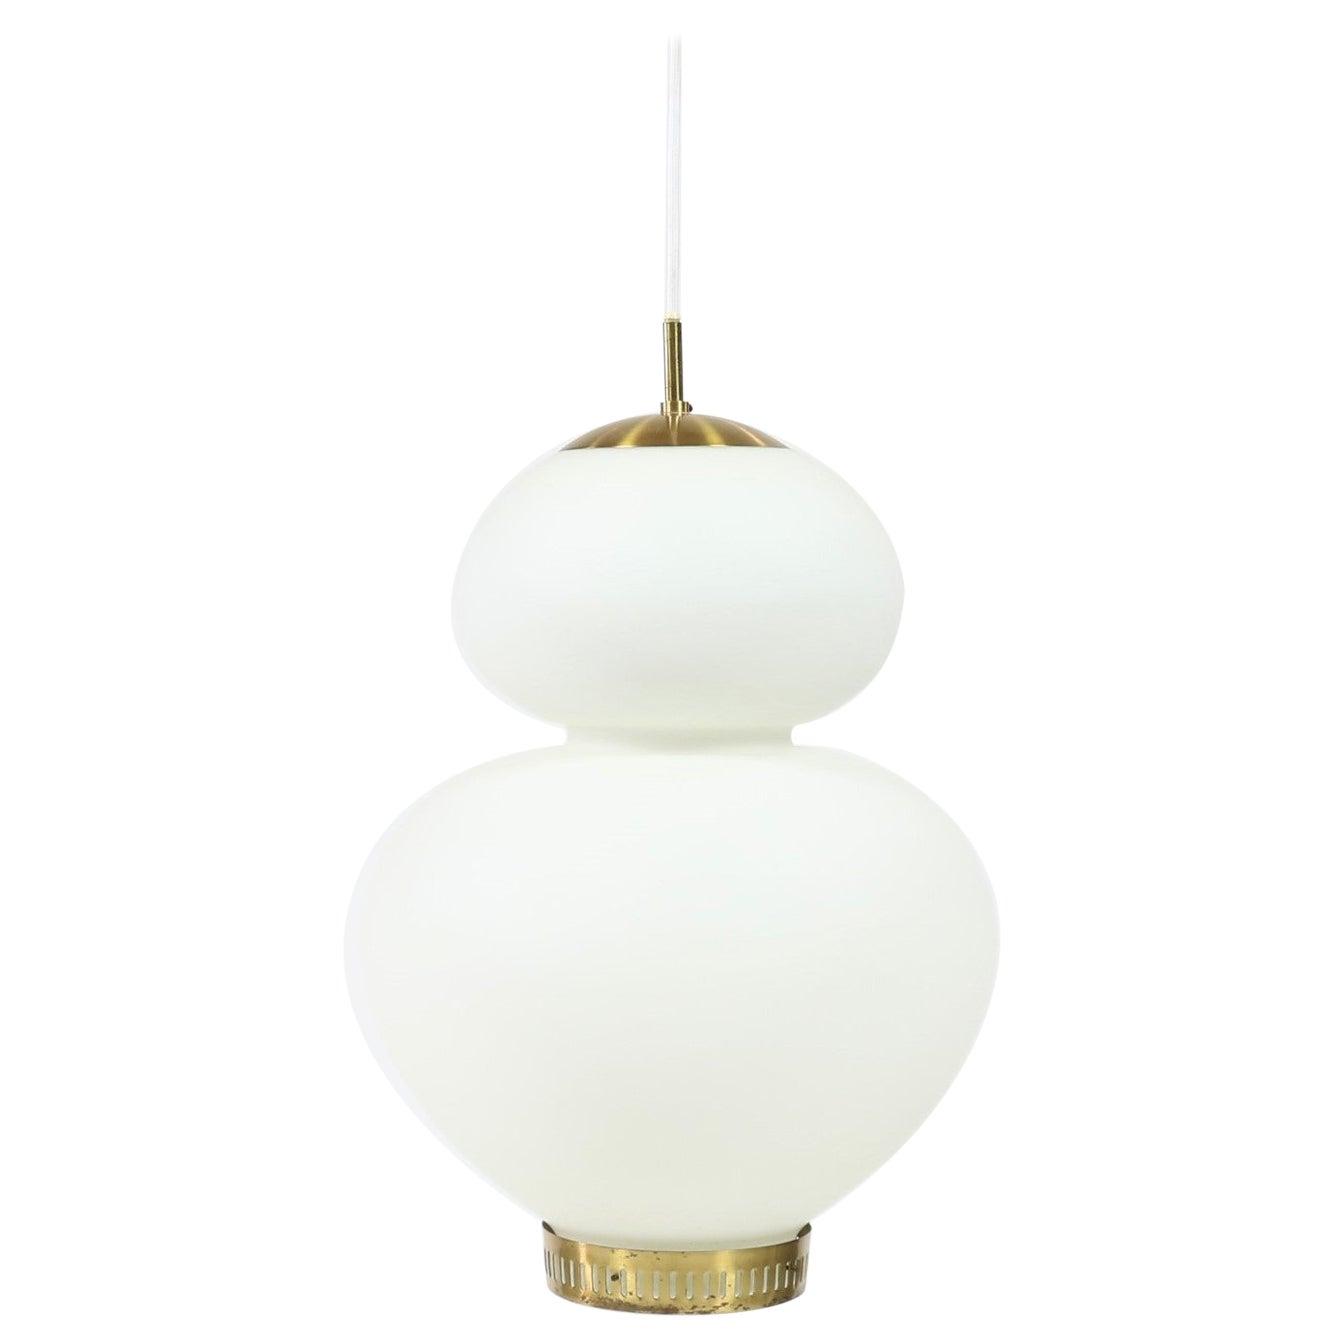 "Huge Danish Modern Brass and Opal Glass ""Peanut"" Pendant by Bent Karlby for LYFA"